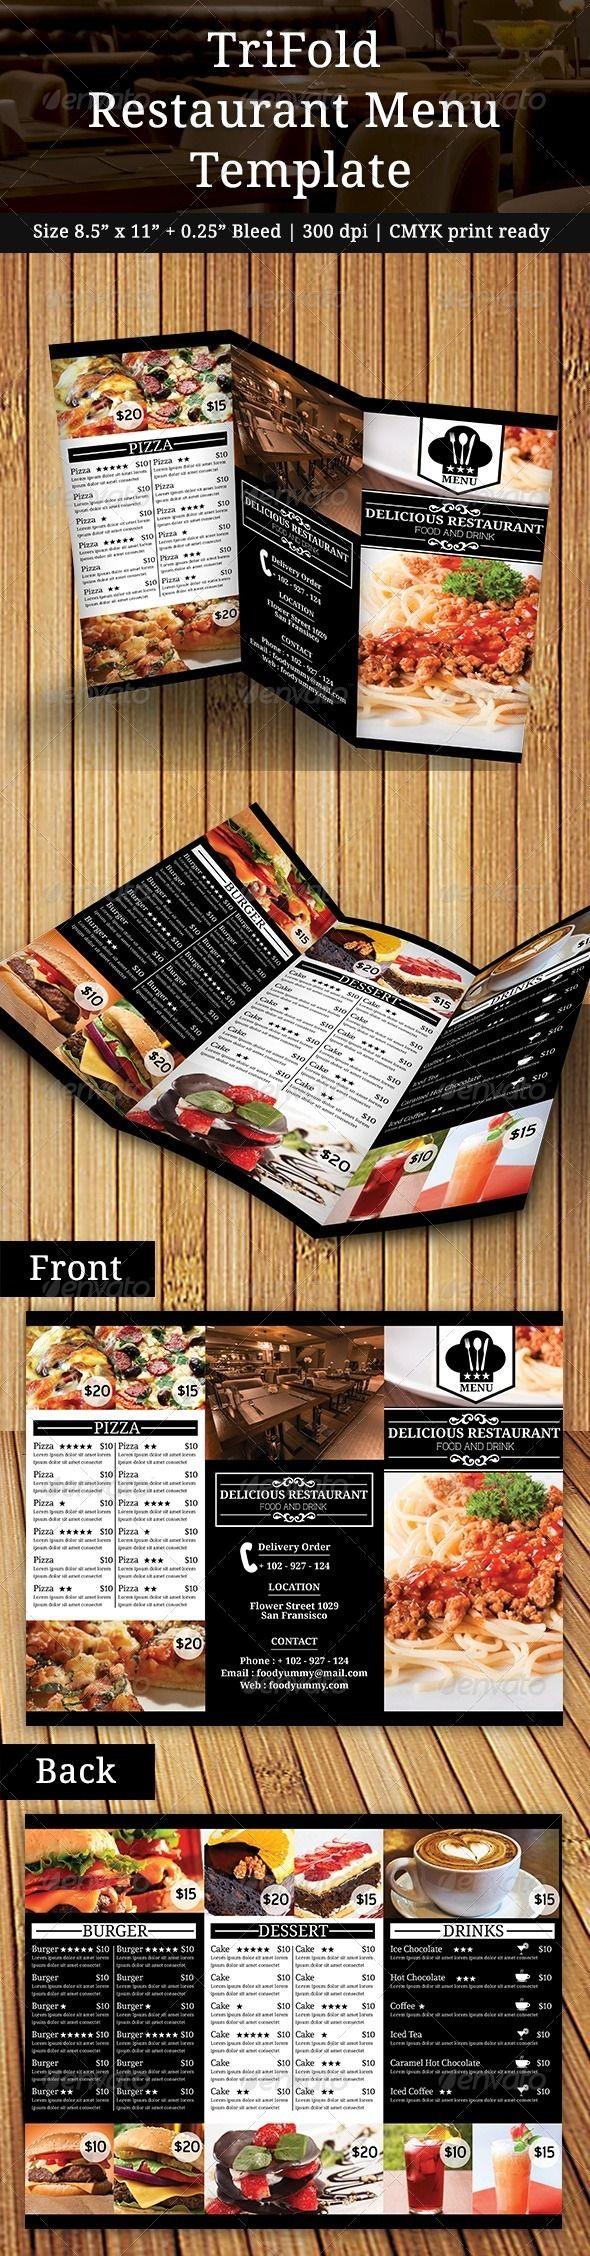 TriFold Restaurant Menu Template #design #speisekarte Download: http://graphicriver.net/item/trifold-restaurant-menu/7748715?ref=ksioks